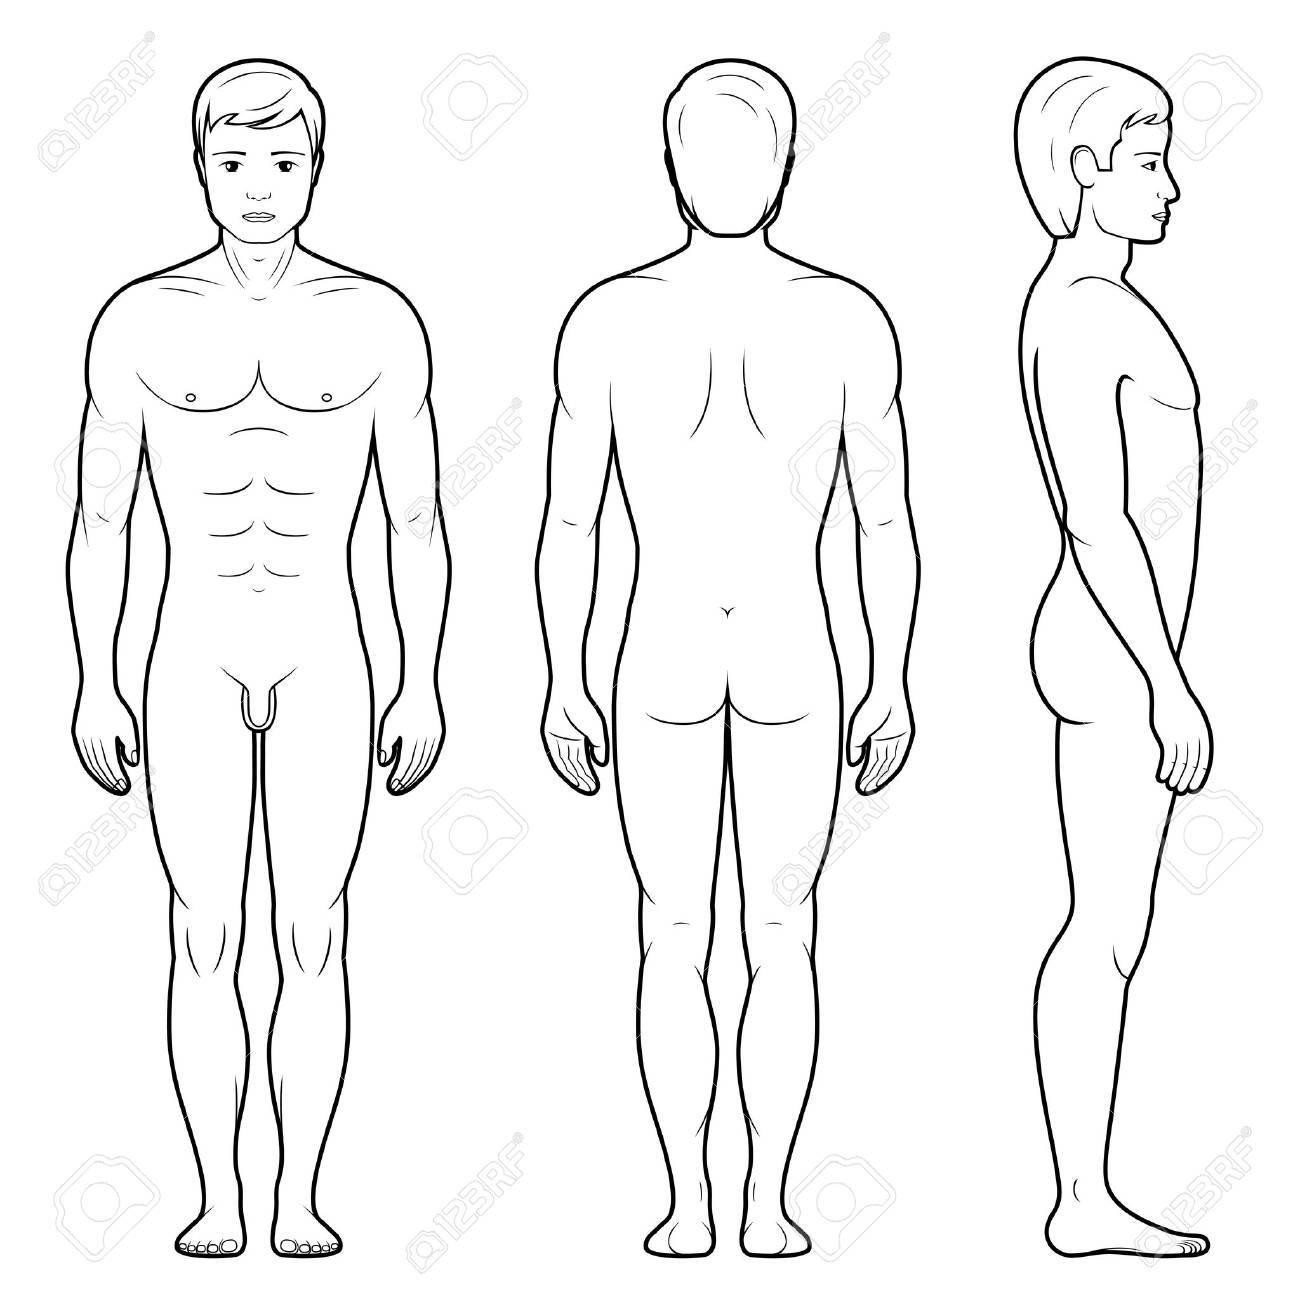 1300x1300 Vector Illustration Of Male Figure